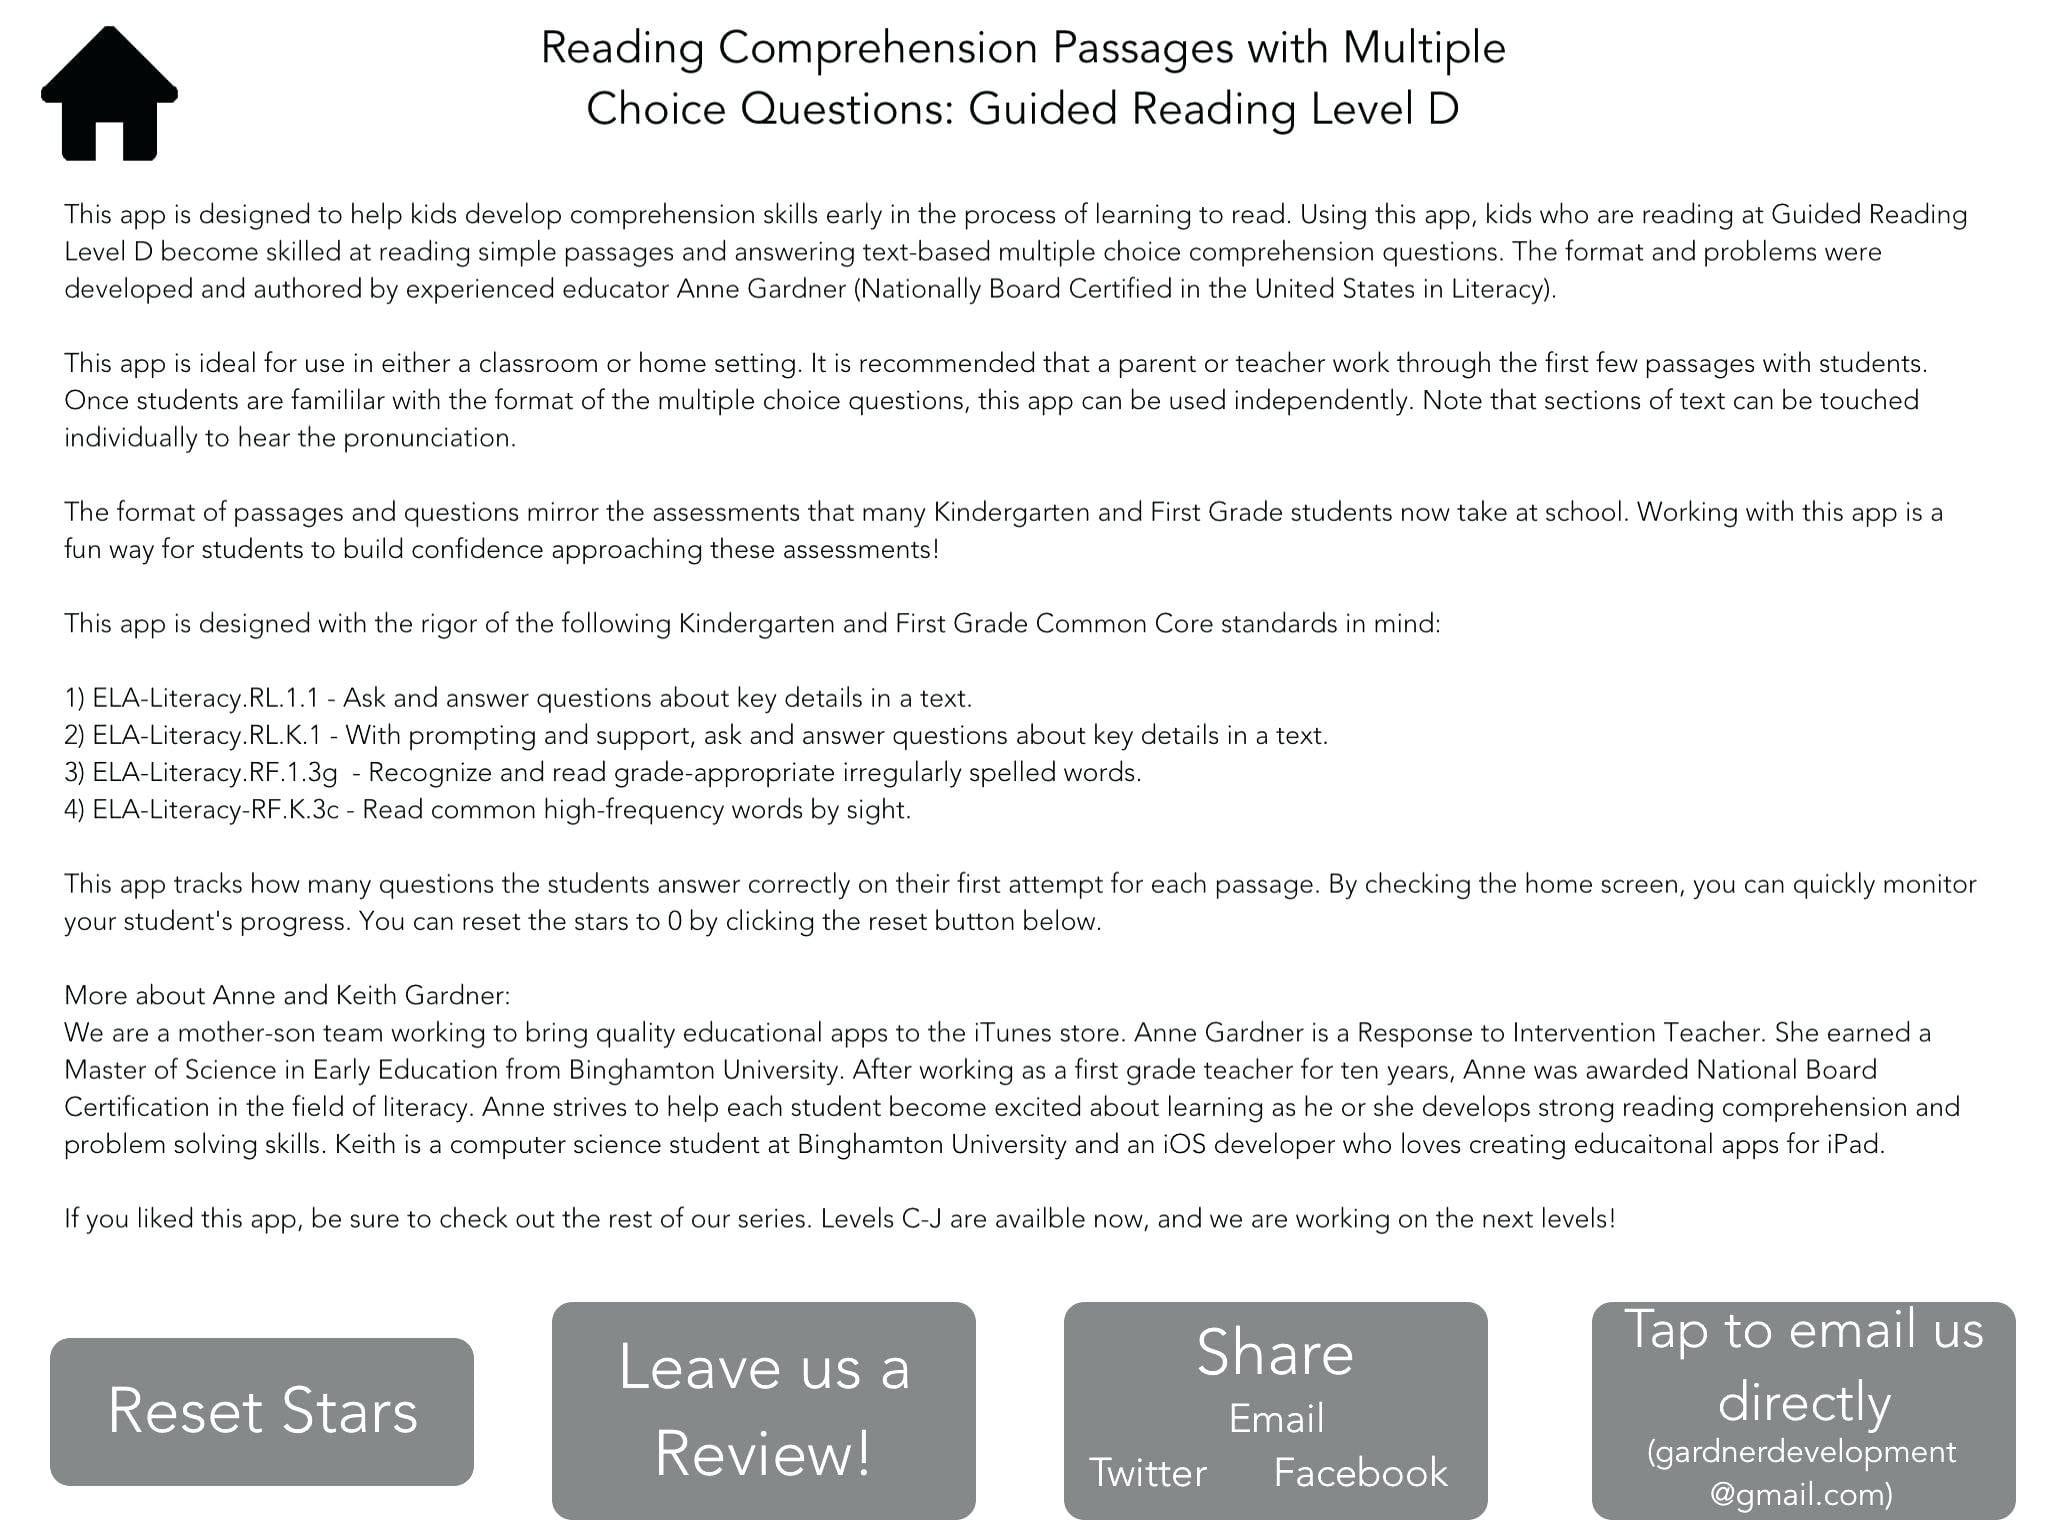 4Th Grade Reading Comprehension Worksheets Pdf To Printable To With Reading Comprehension Worksheets 4Th Grade Common Core